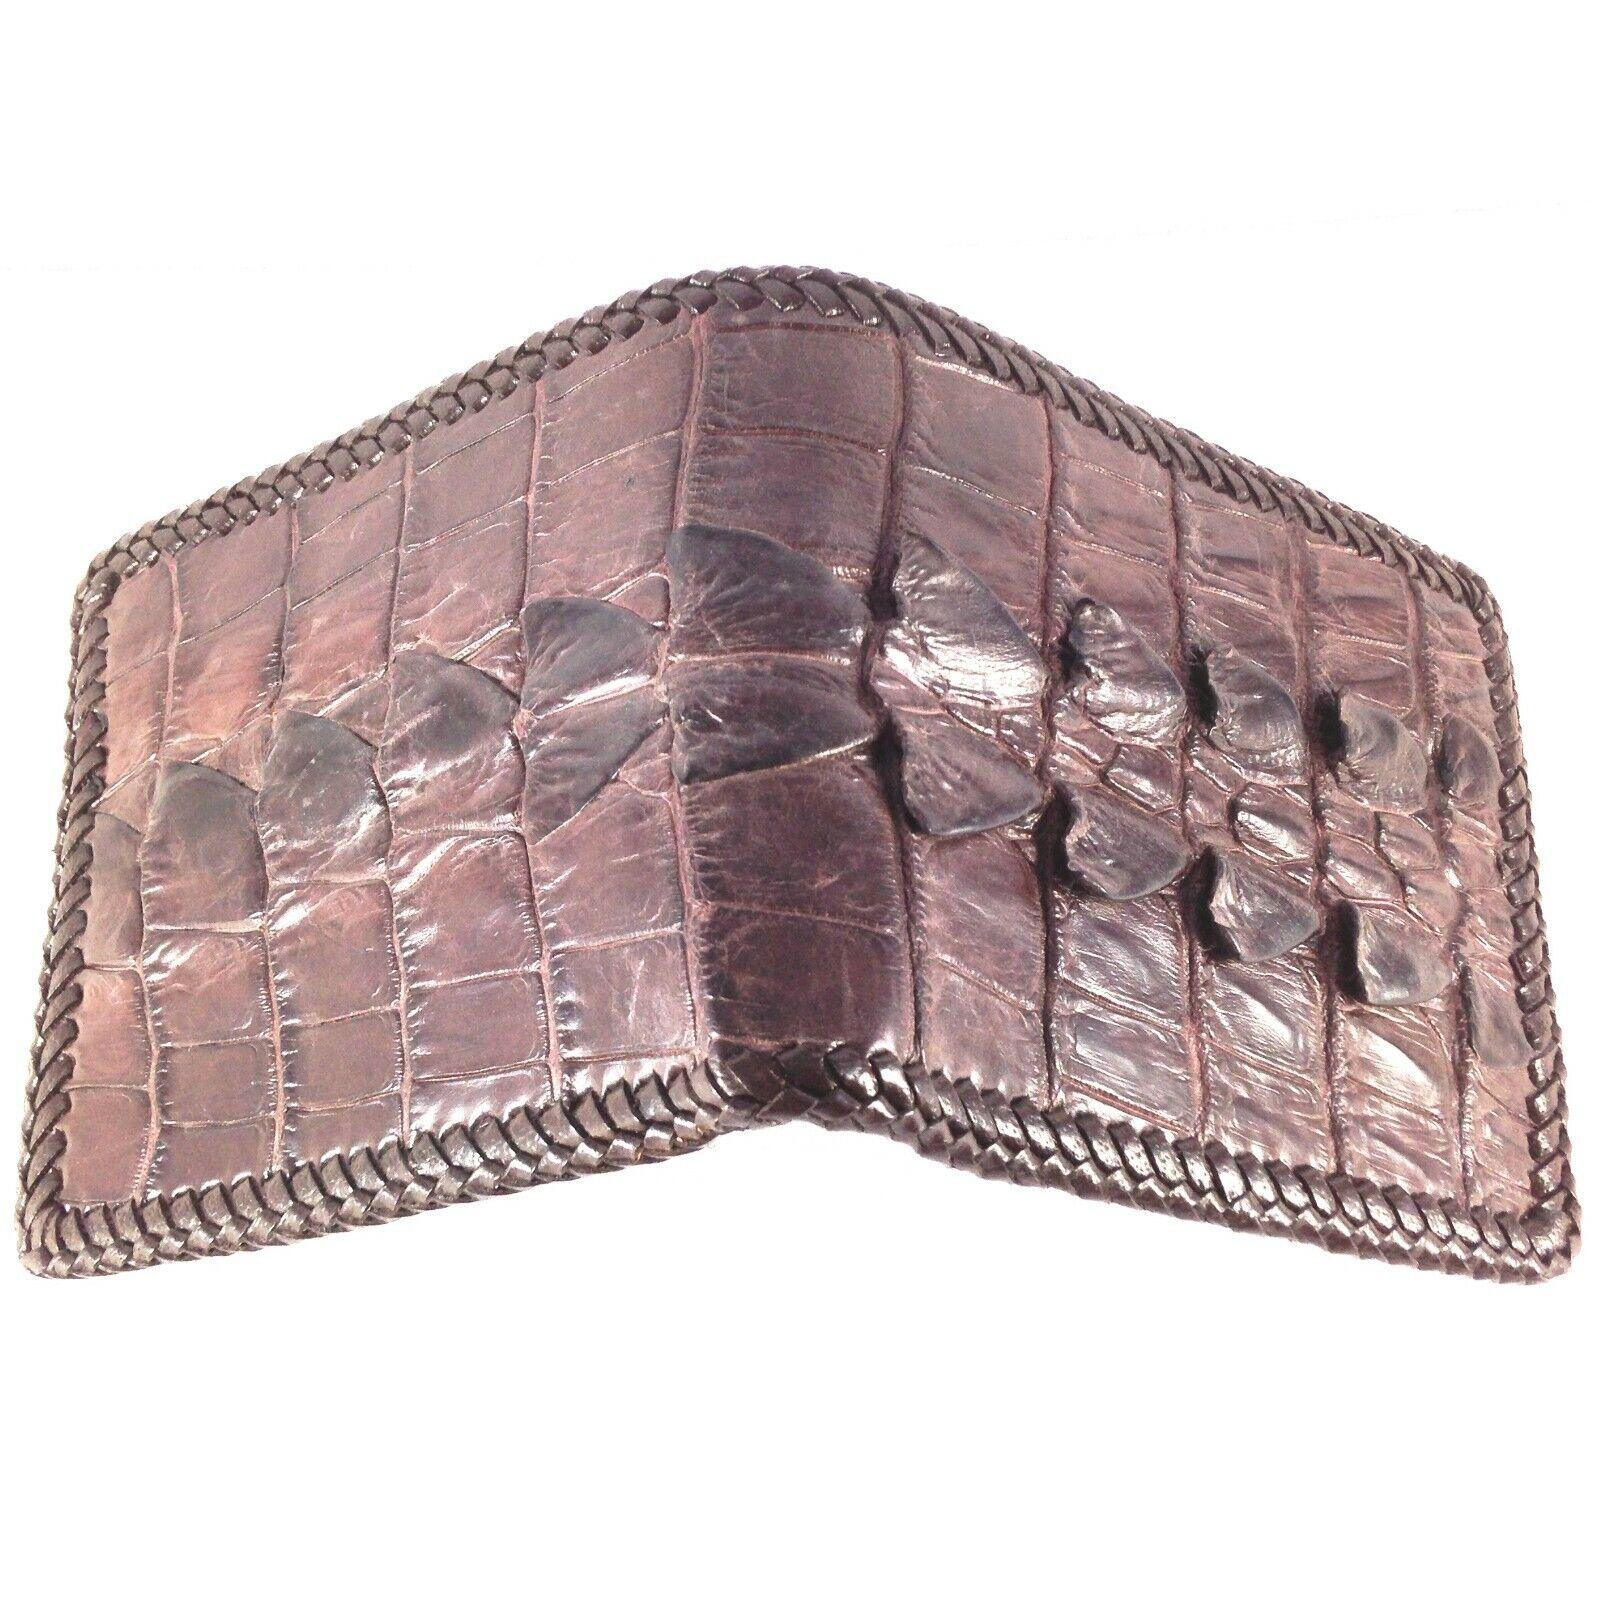 Dark BrownGenuine Crocodile Leather skin Men Bifold Wallet Handmade 25